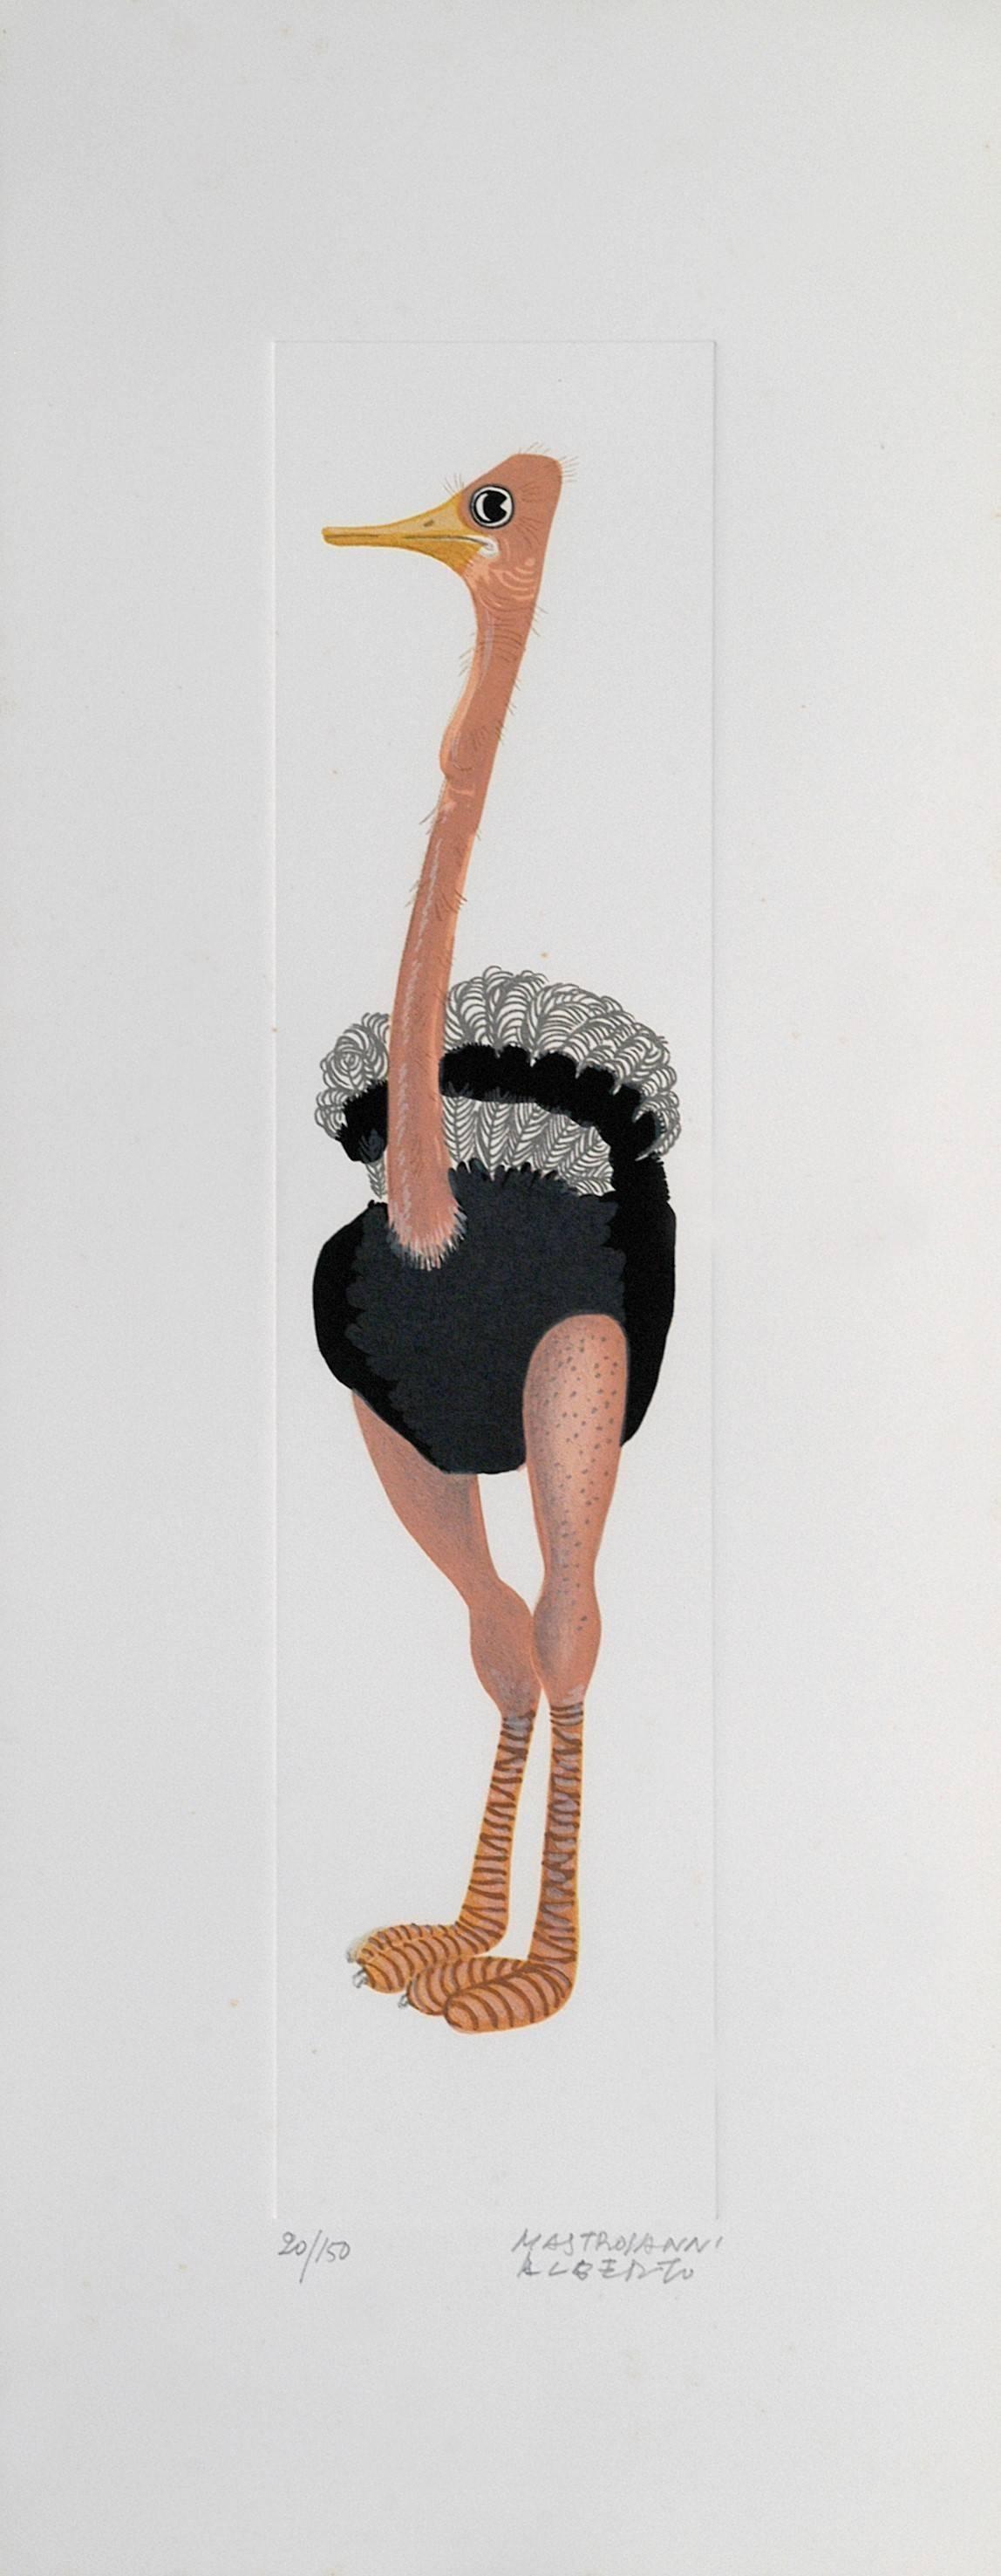 Ostrich - Original Lithograph by A. Mastroianni - 1970s